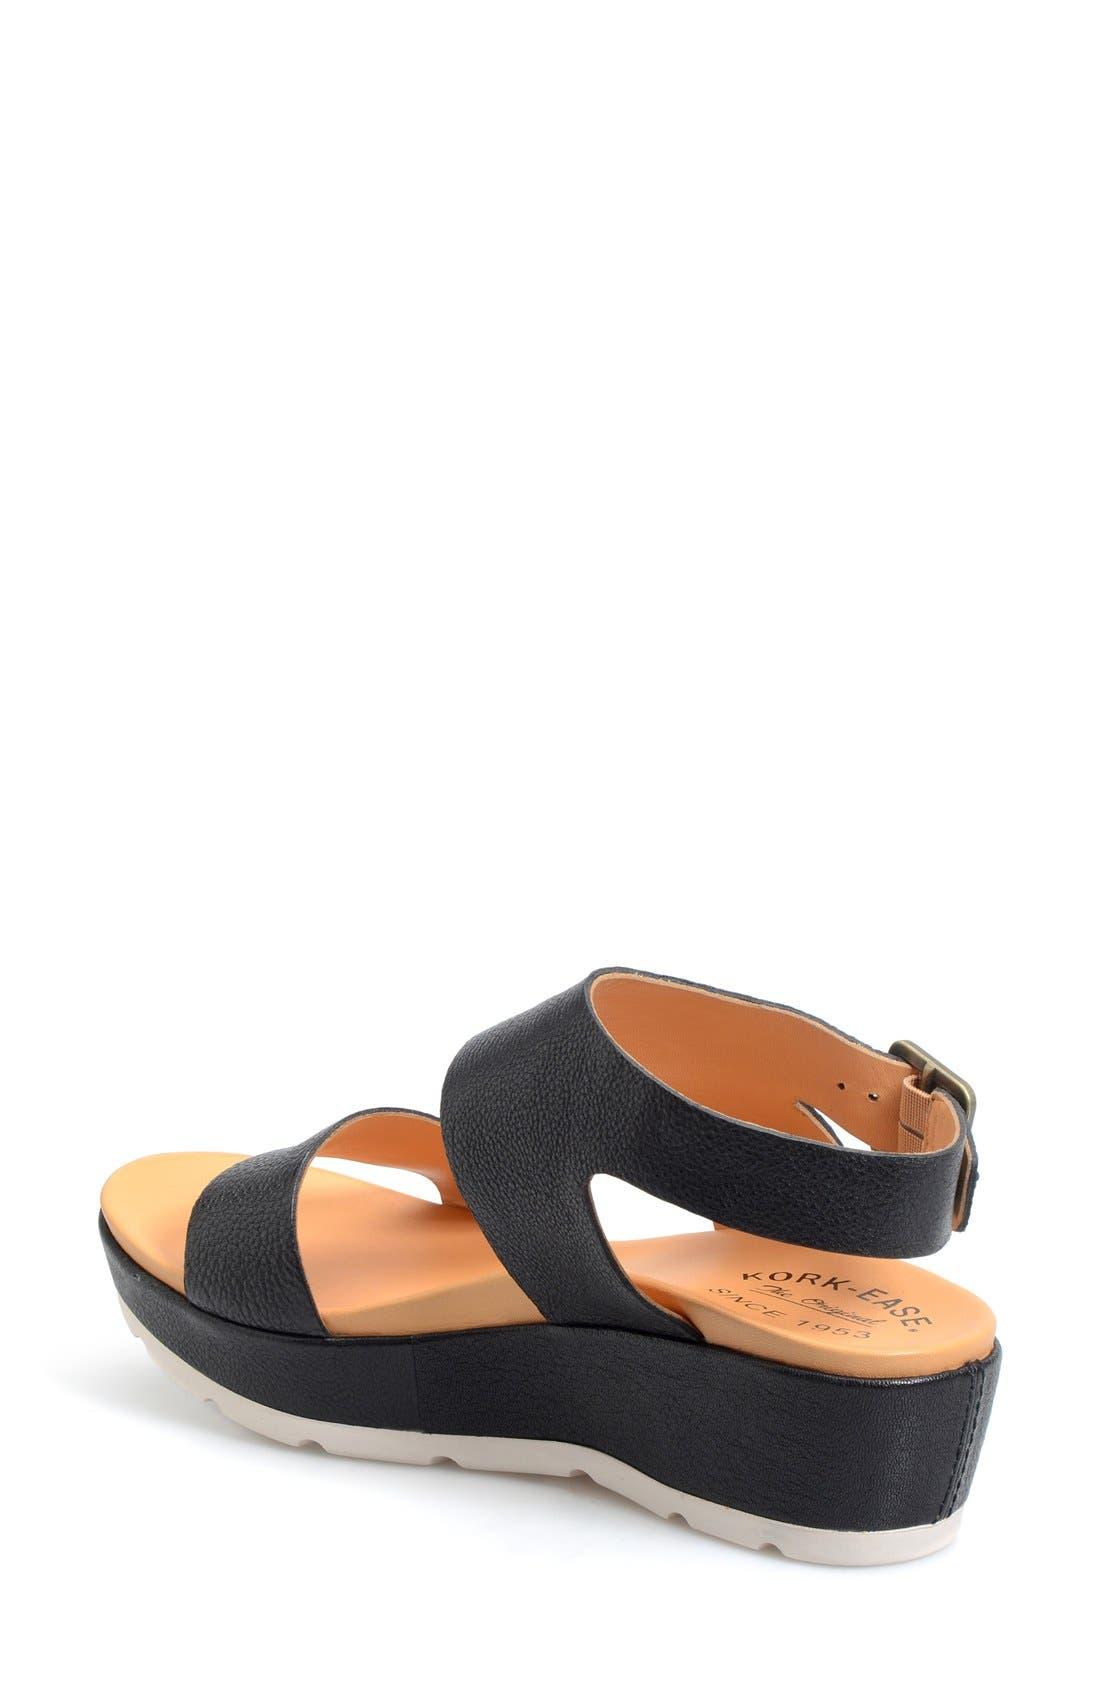 'Khloe' Platform Wedge Sandal,                             Alternate thumbnail 6, color,